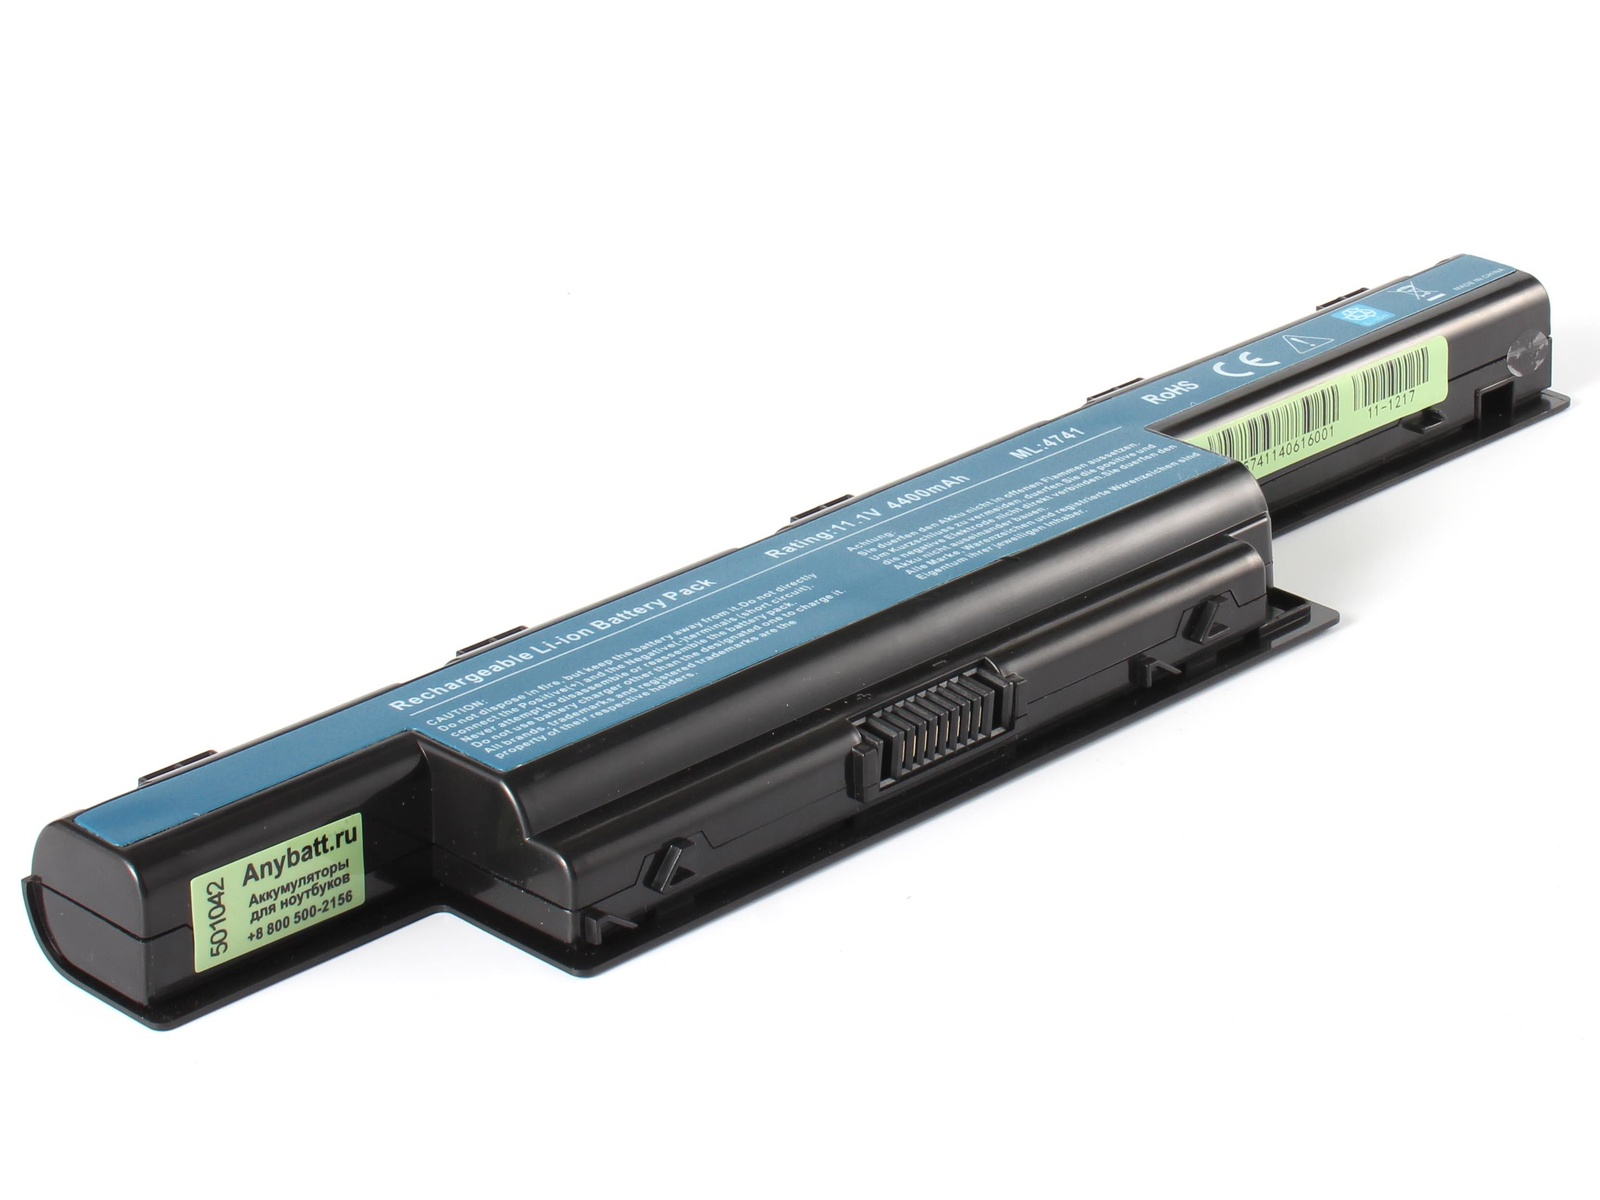 Аккумулятор для ноутбука AnyBatt для Acer Aspire E1-731G-20204G50Mn, Aspire V3-531G-B9804G50Ma, Aspire V3-551G-10464G50Makk, Aspire V3-571-33124G75Ma, Aspire V3-571G-33126G50Ma, Aspire V3-571G-53218G1TMa, Aspire V3-571G-53236G50Ma подставка для телевизора акма v3 600 10viz